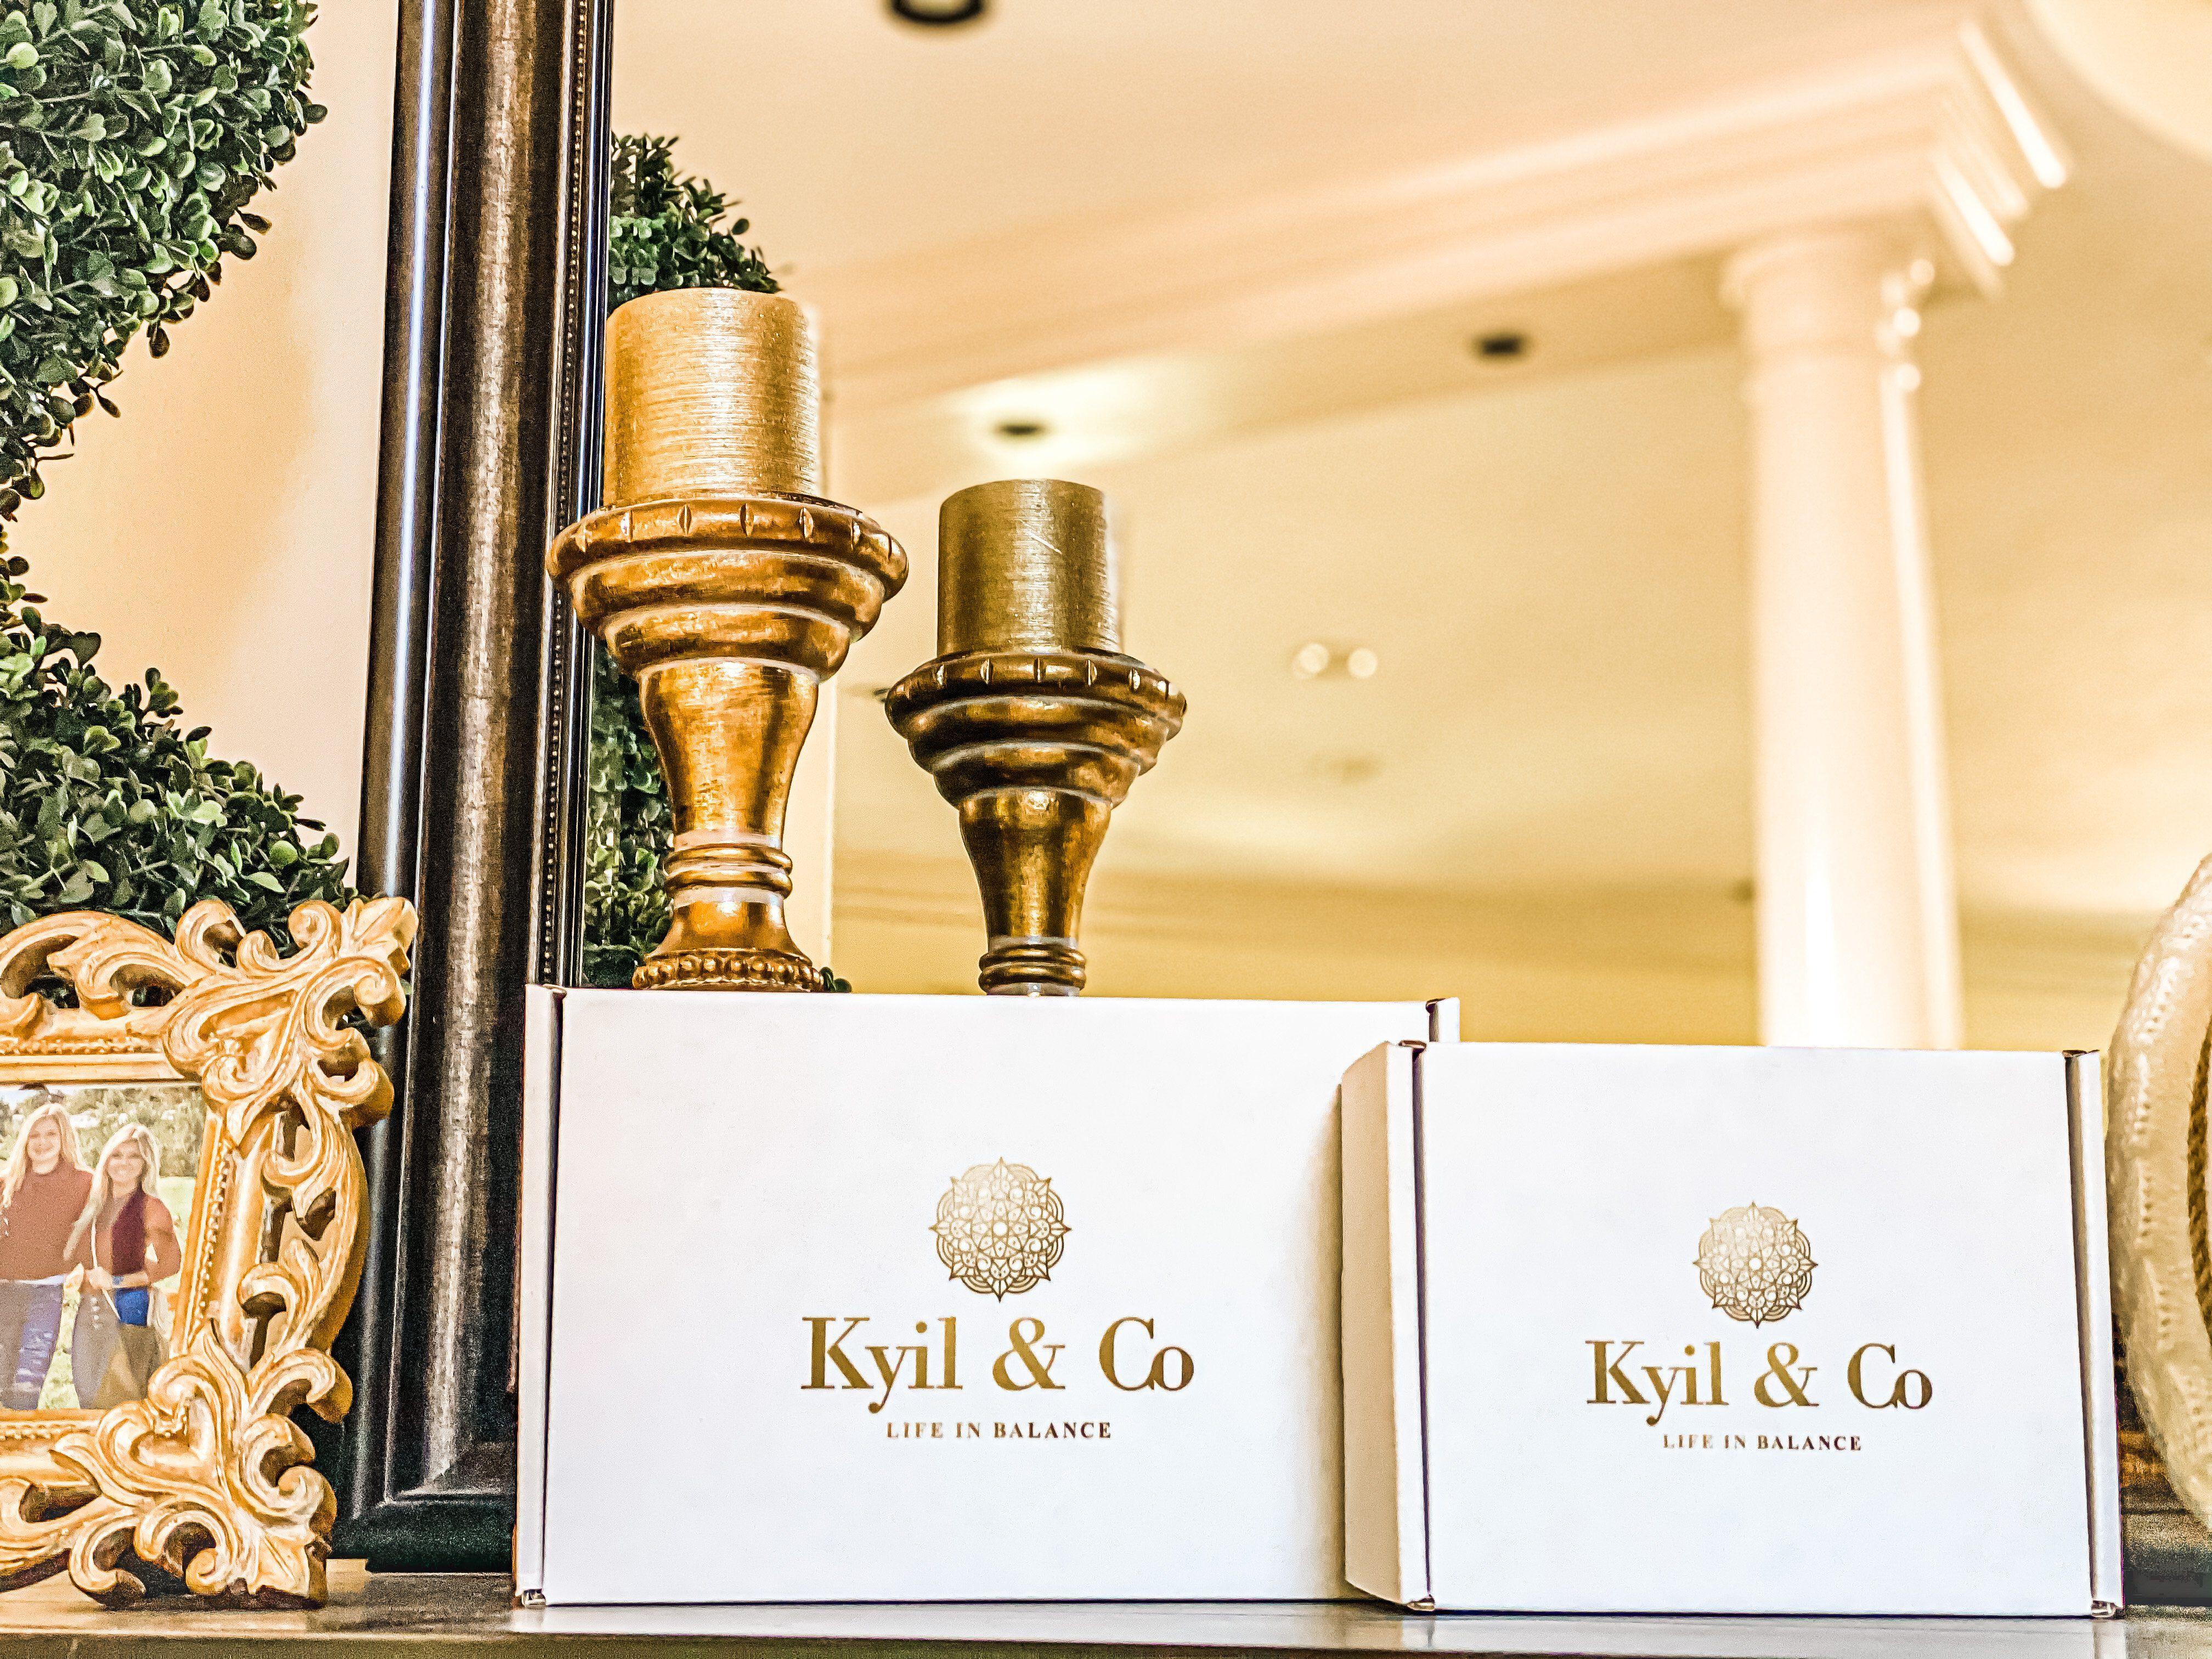 Kyil & Co Subscription Box